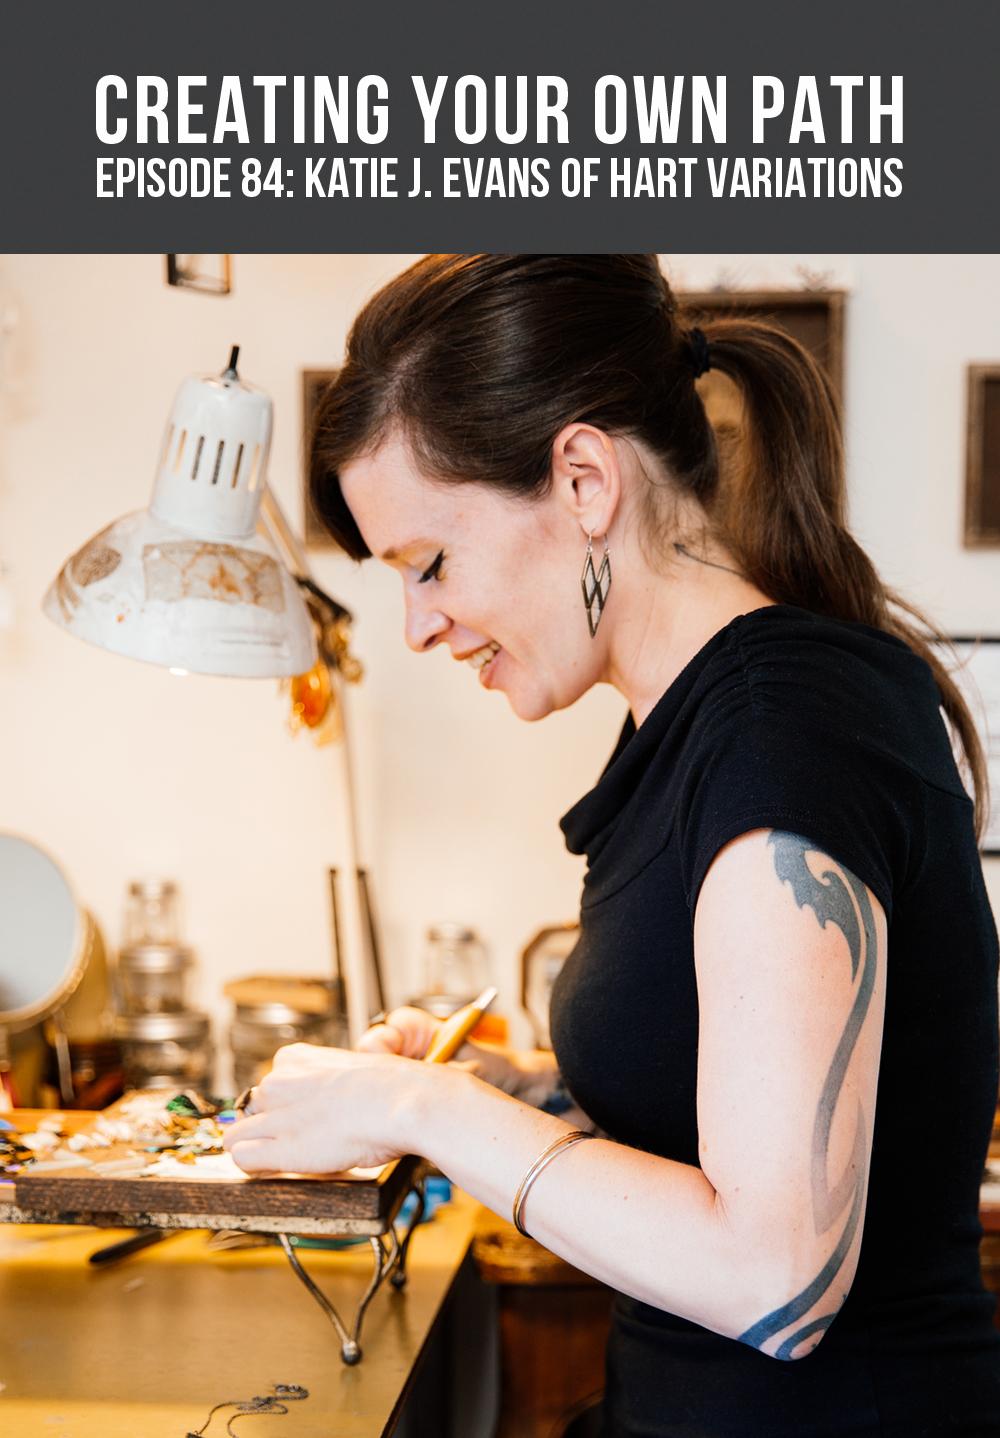 Katie J. Evans, Hart Variations // creatingyourownpath.com